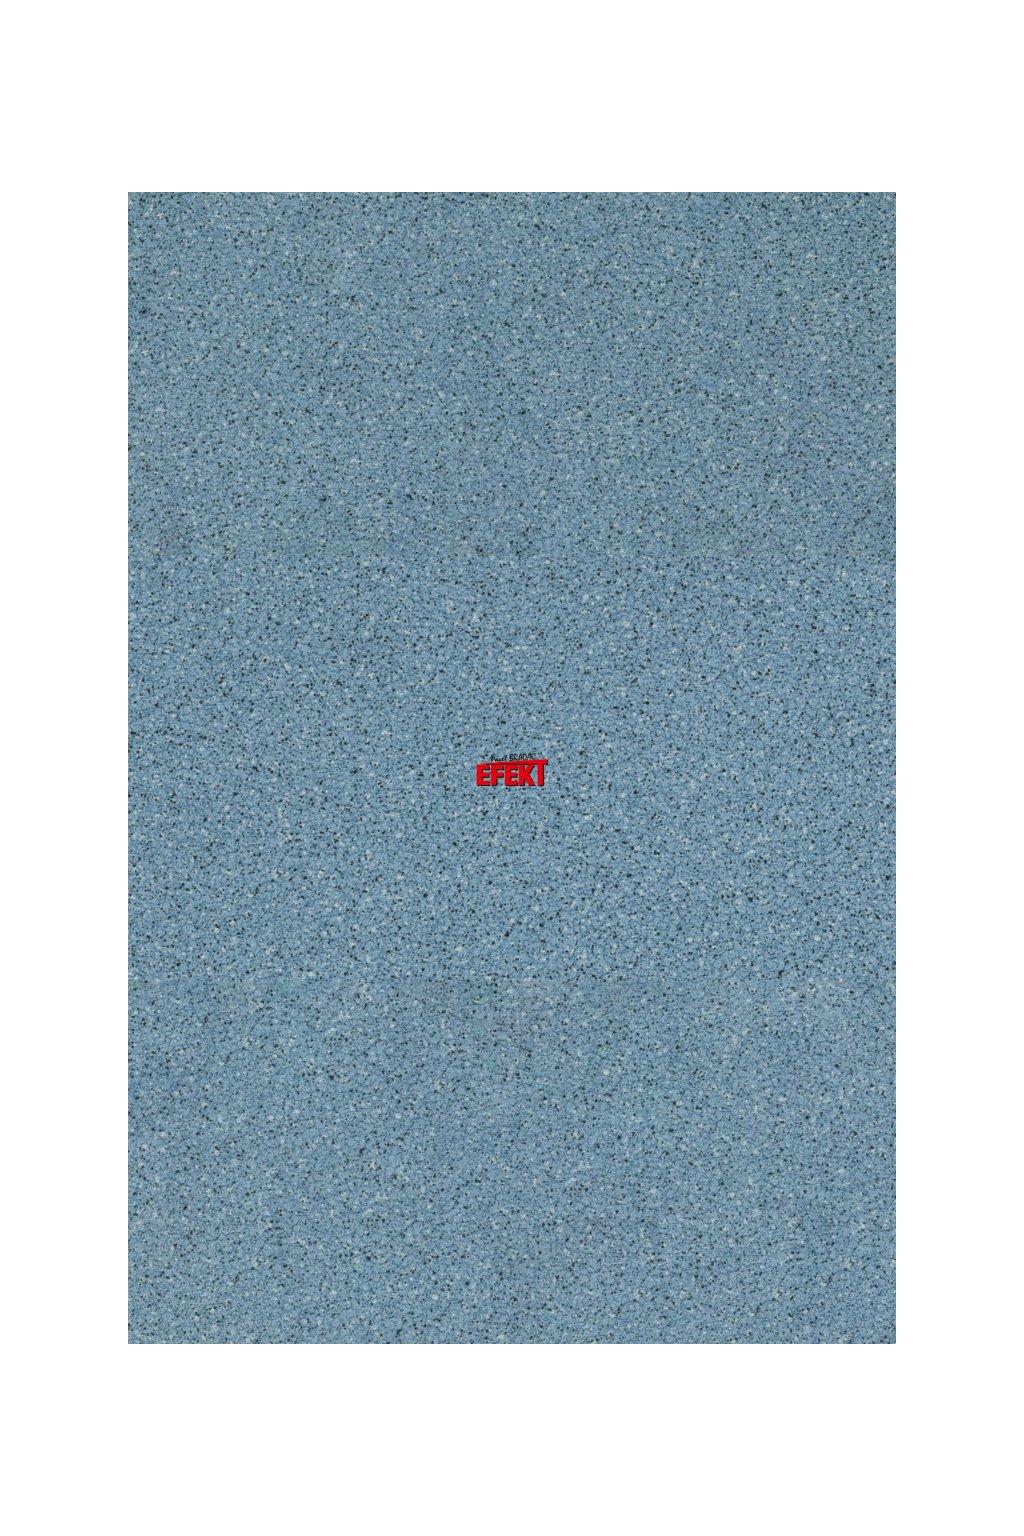 Gerflor Timberline Pixel Ocean 2182